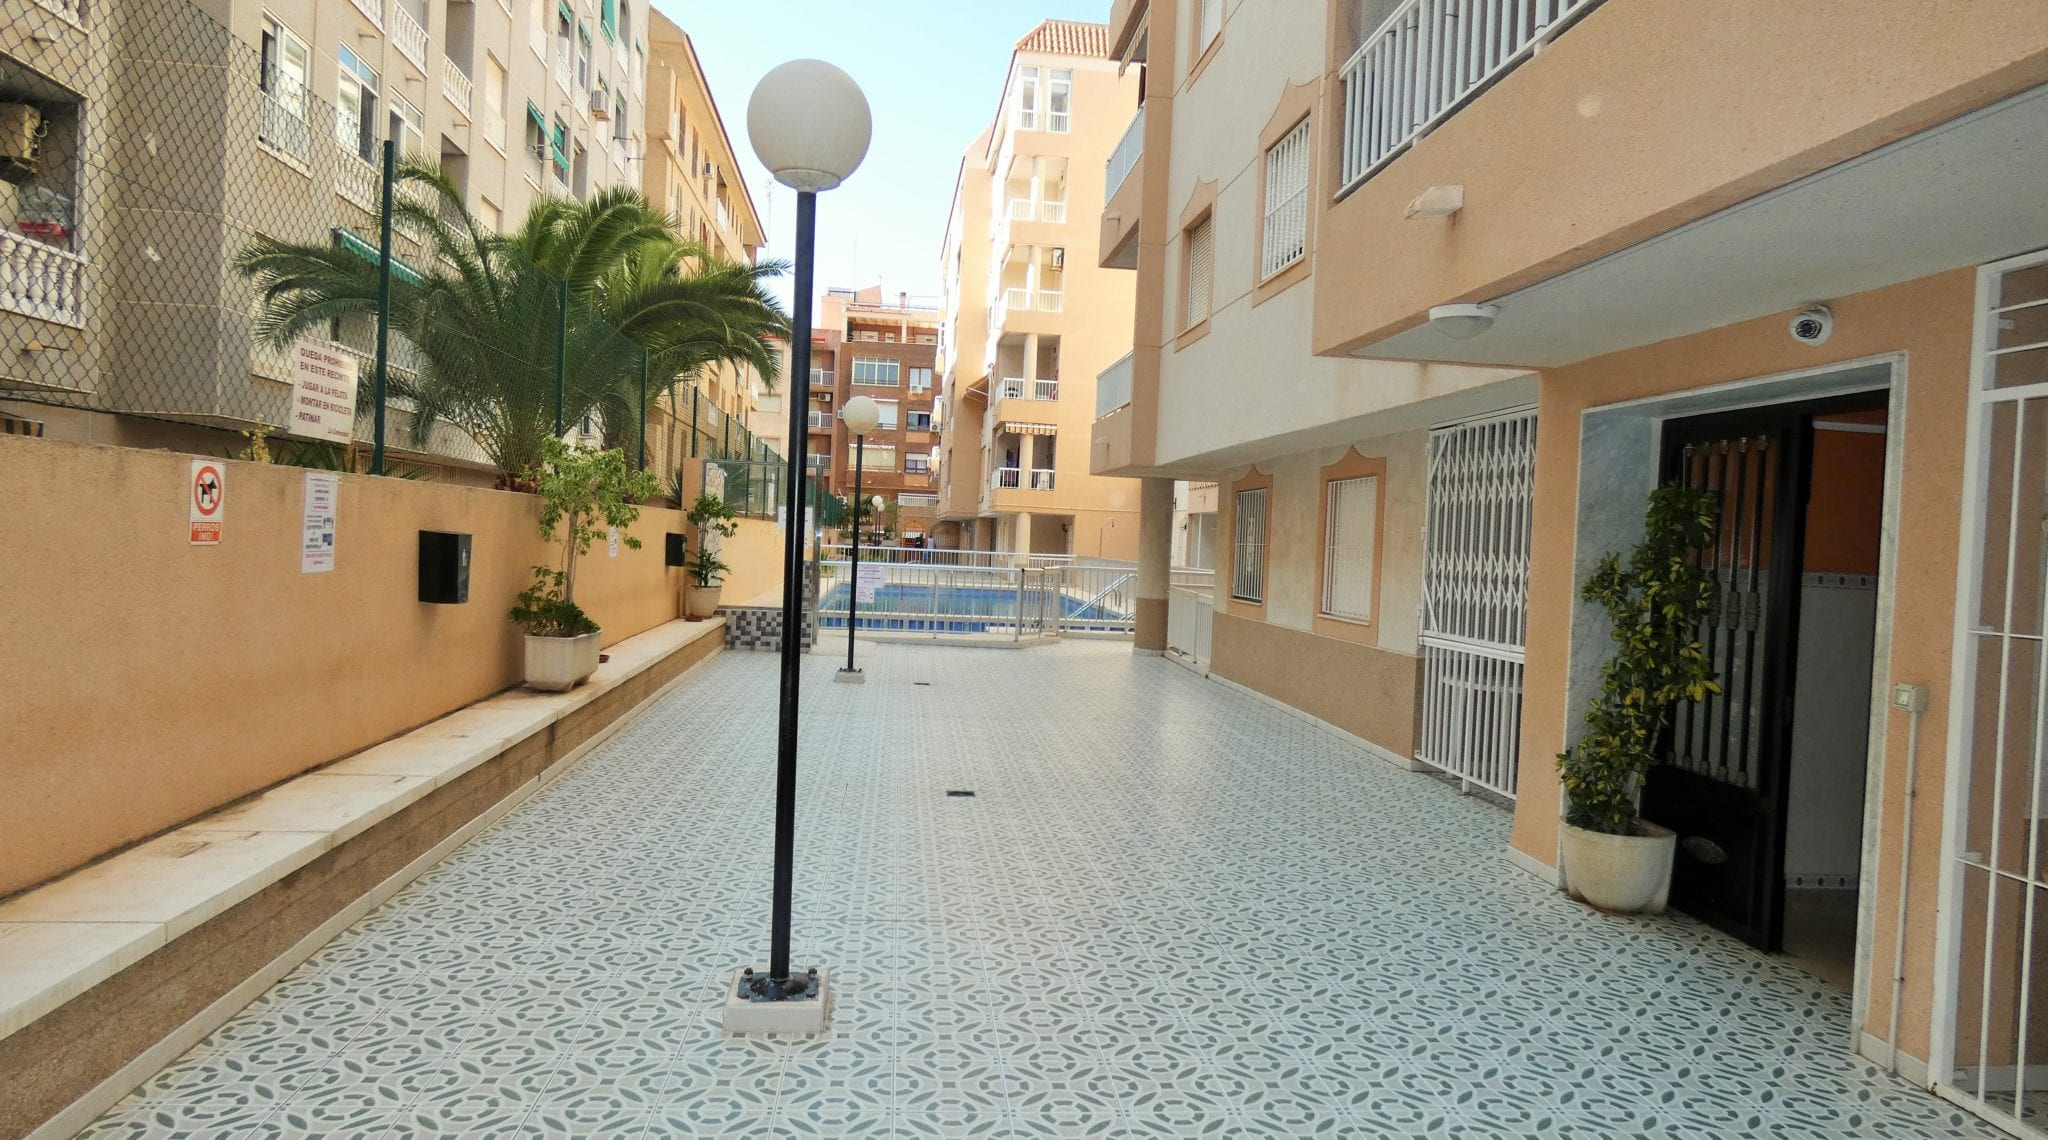 Calle Urbano Arregui, 17 (18)